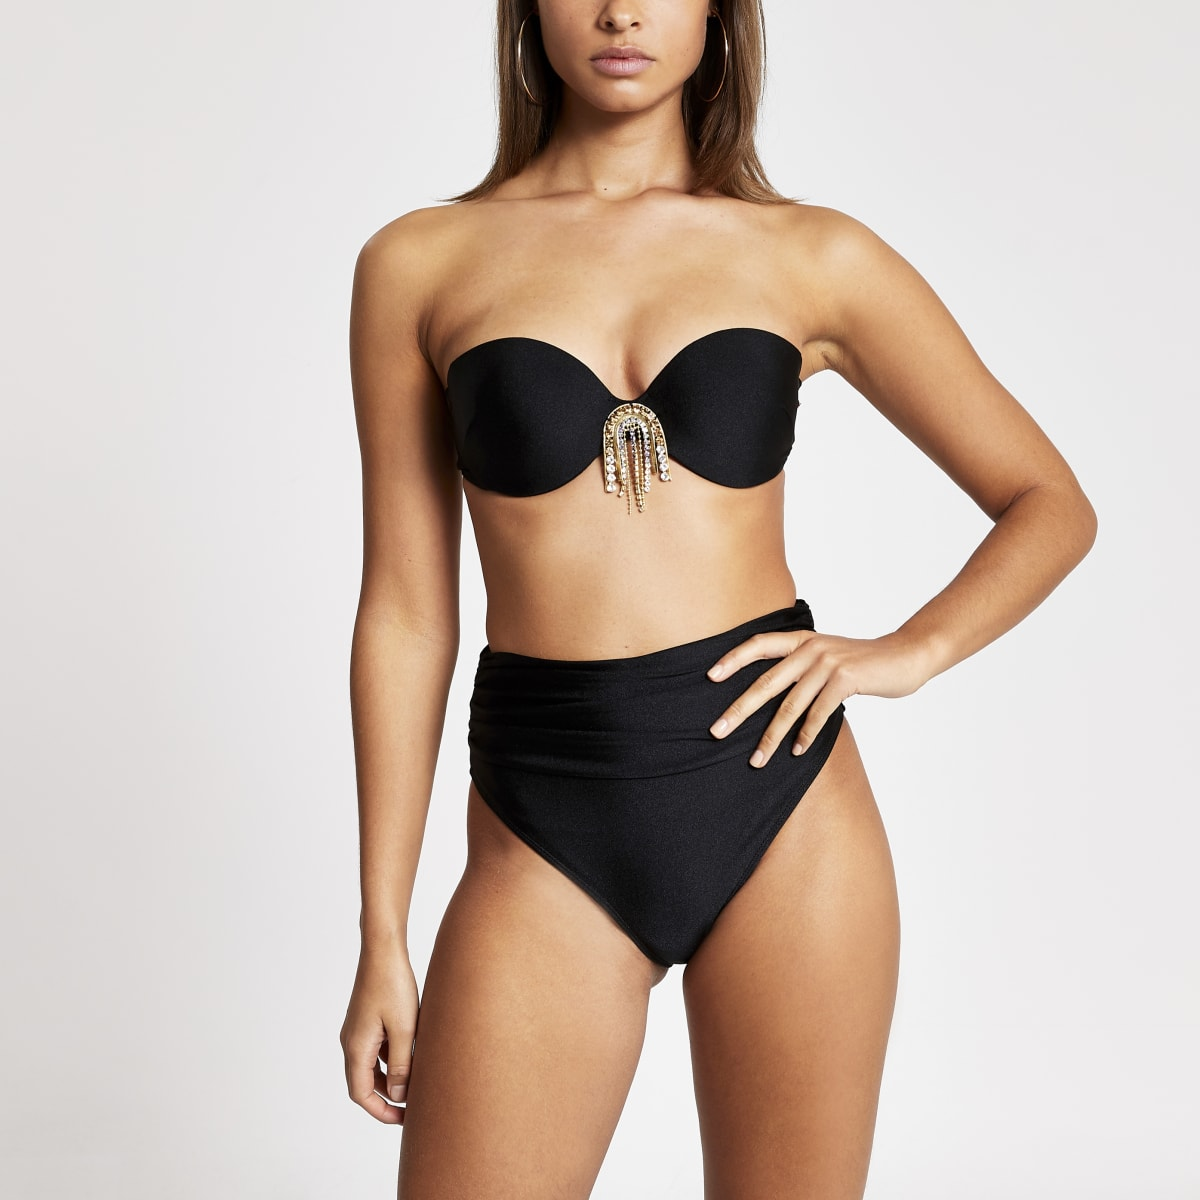 Bas de bikini noir froncétaille haute